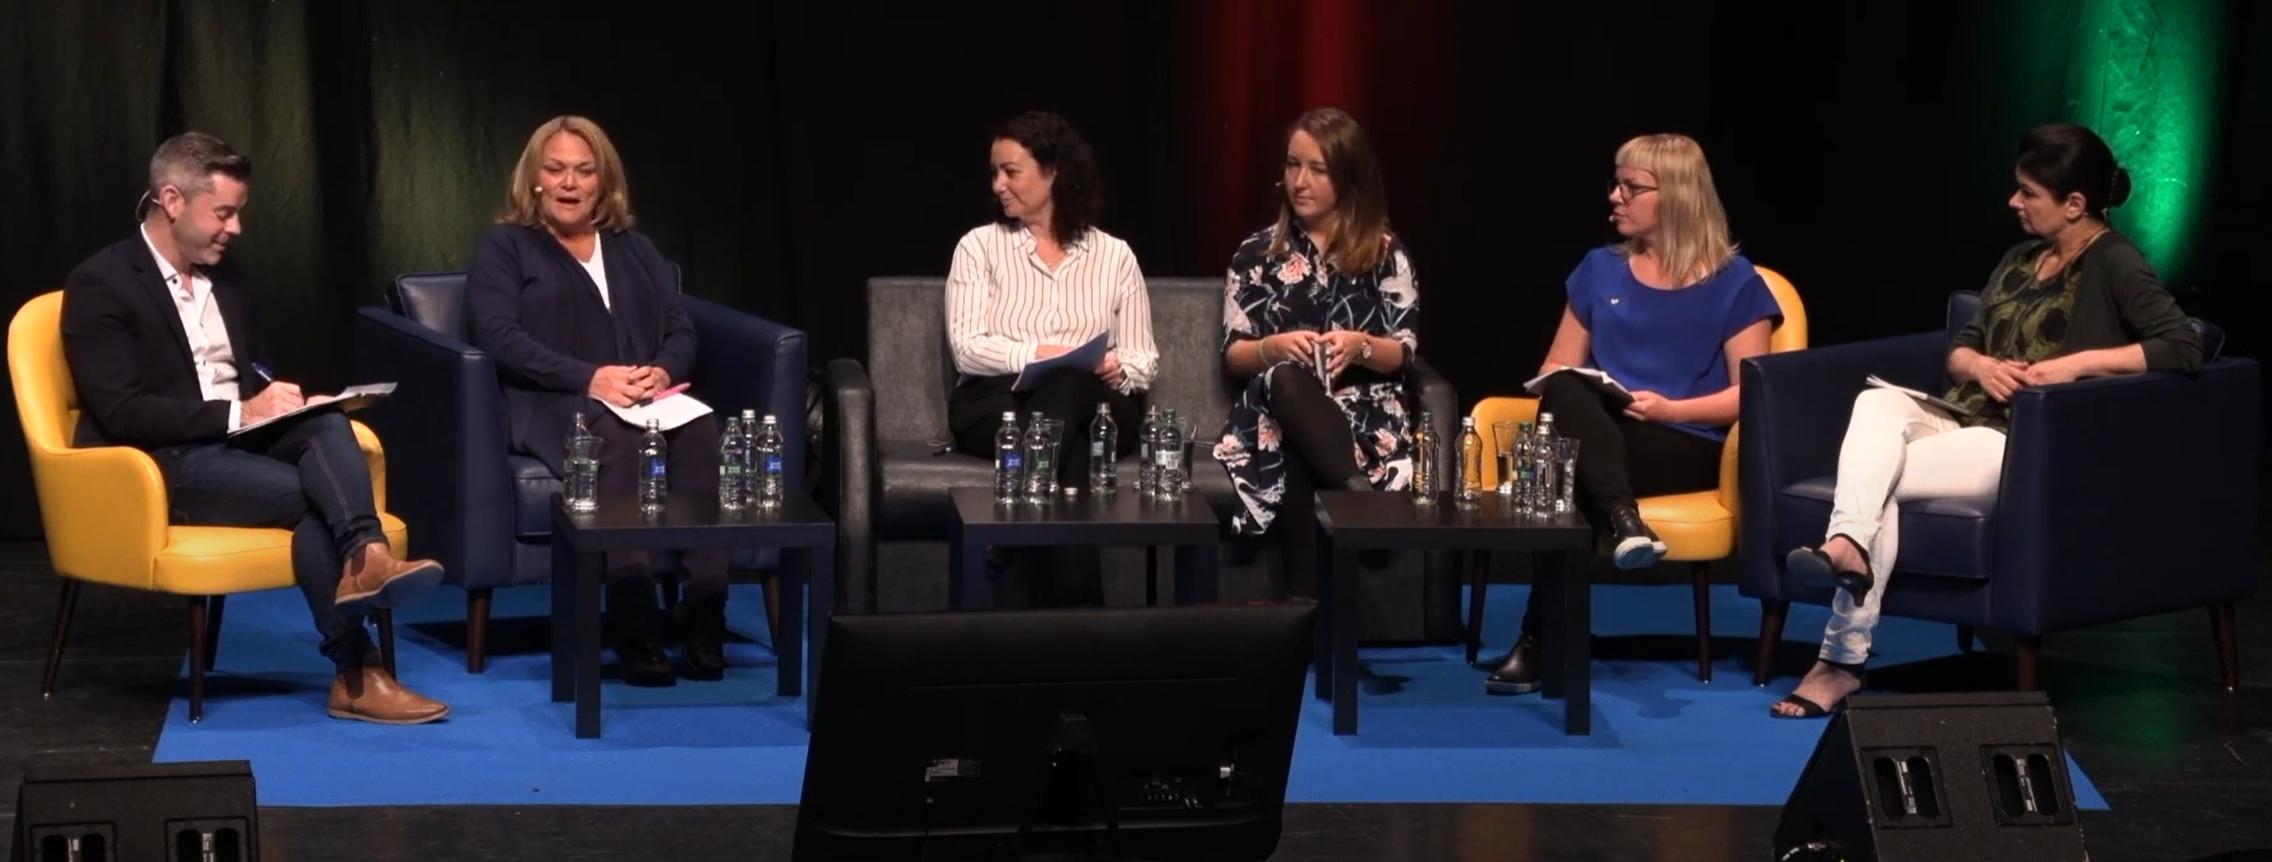 WABF 2019 Panel session